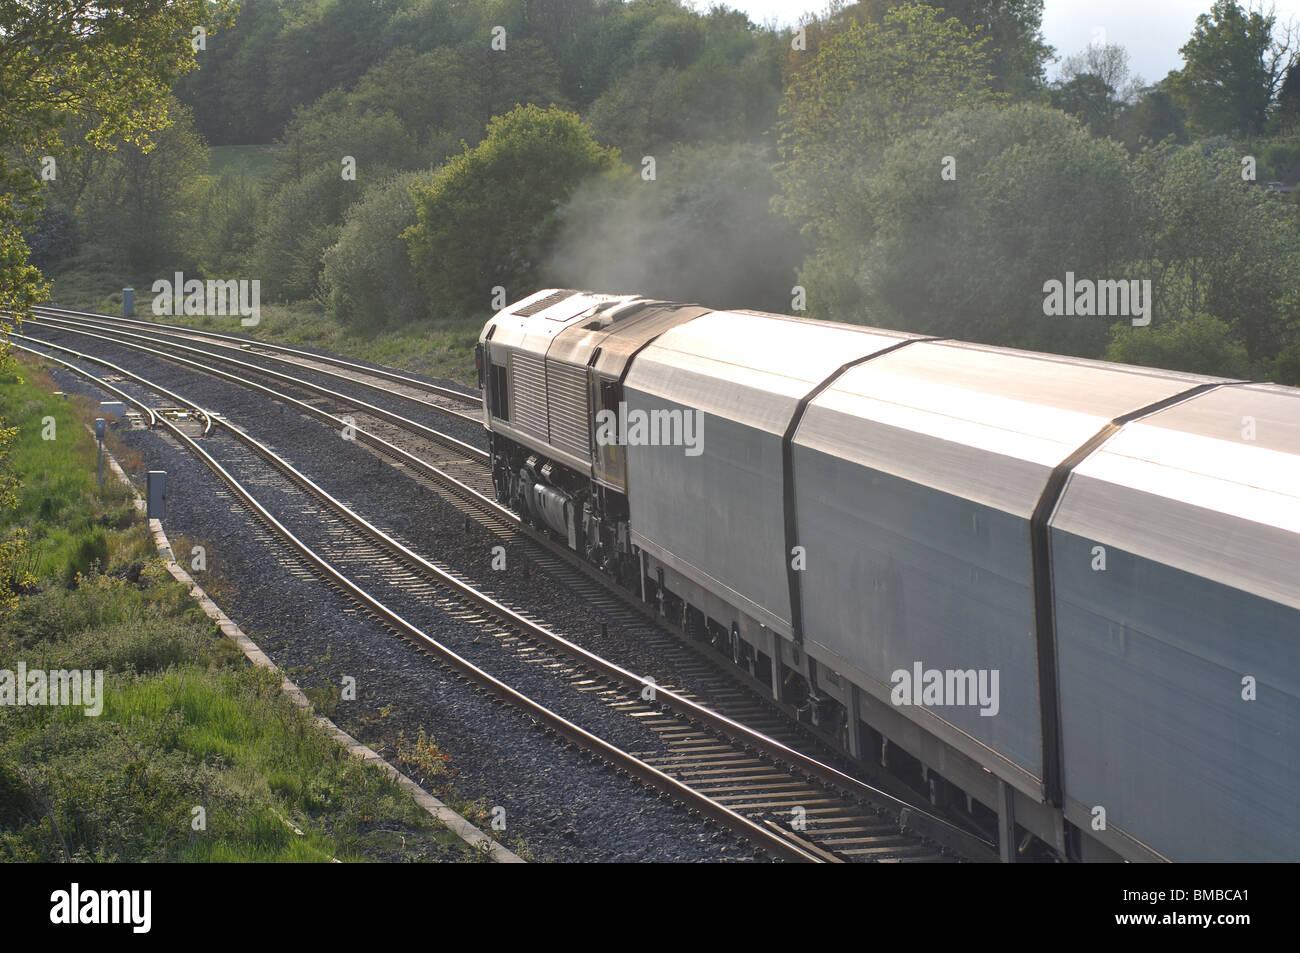 Diesel locomotive pulling covered car transporter wagons, UK - Stock Image